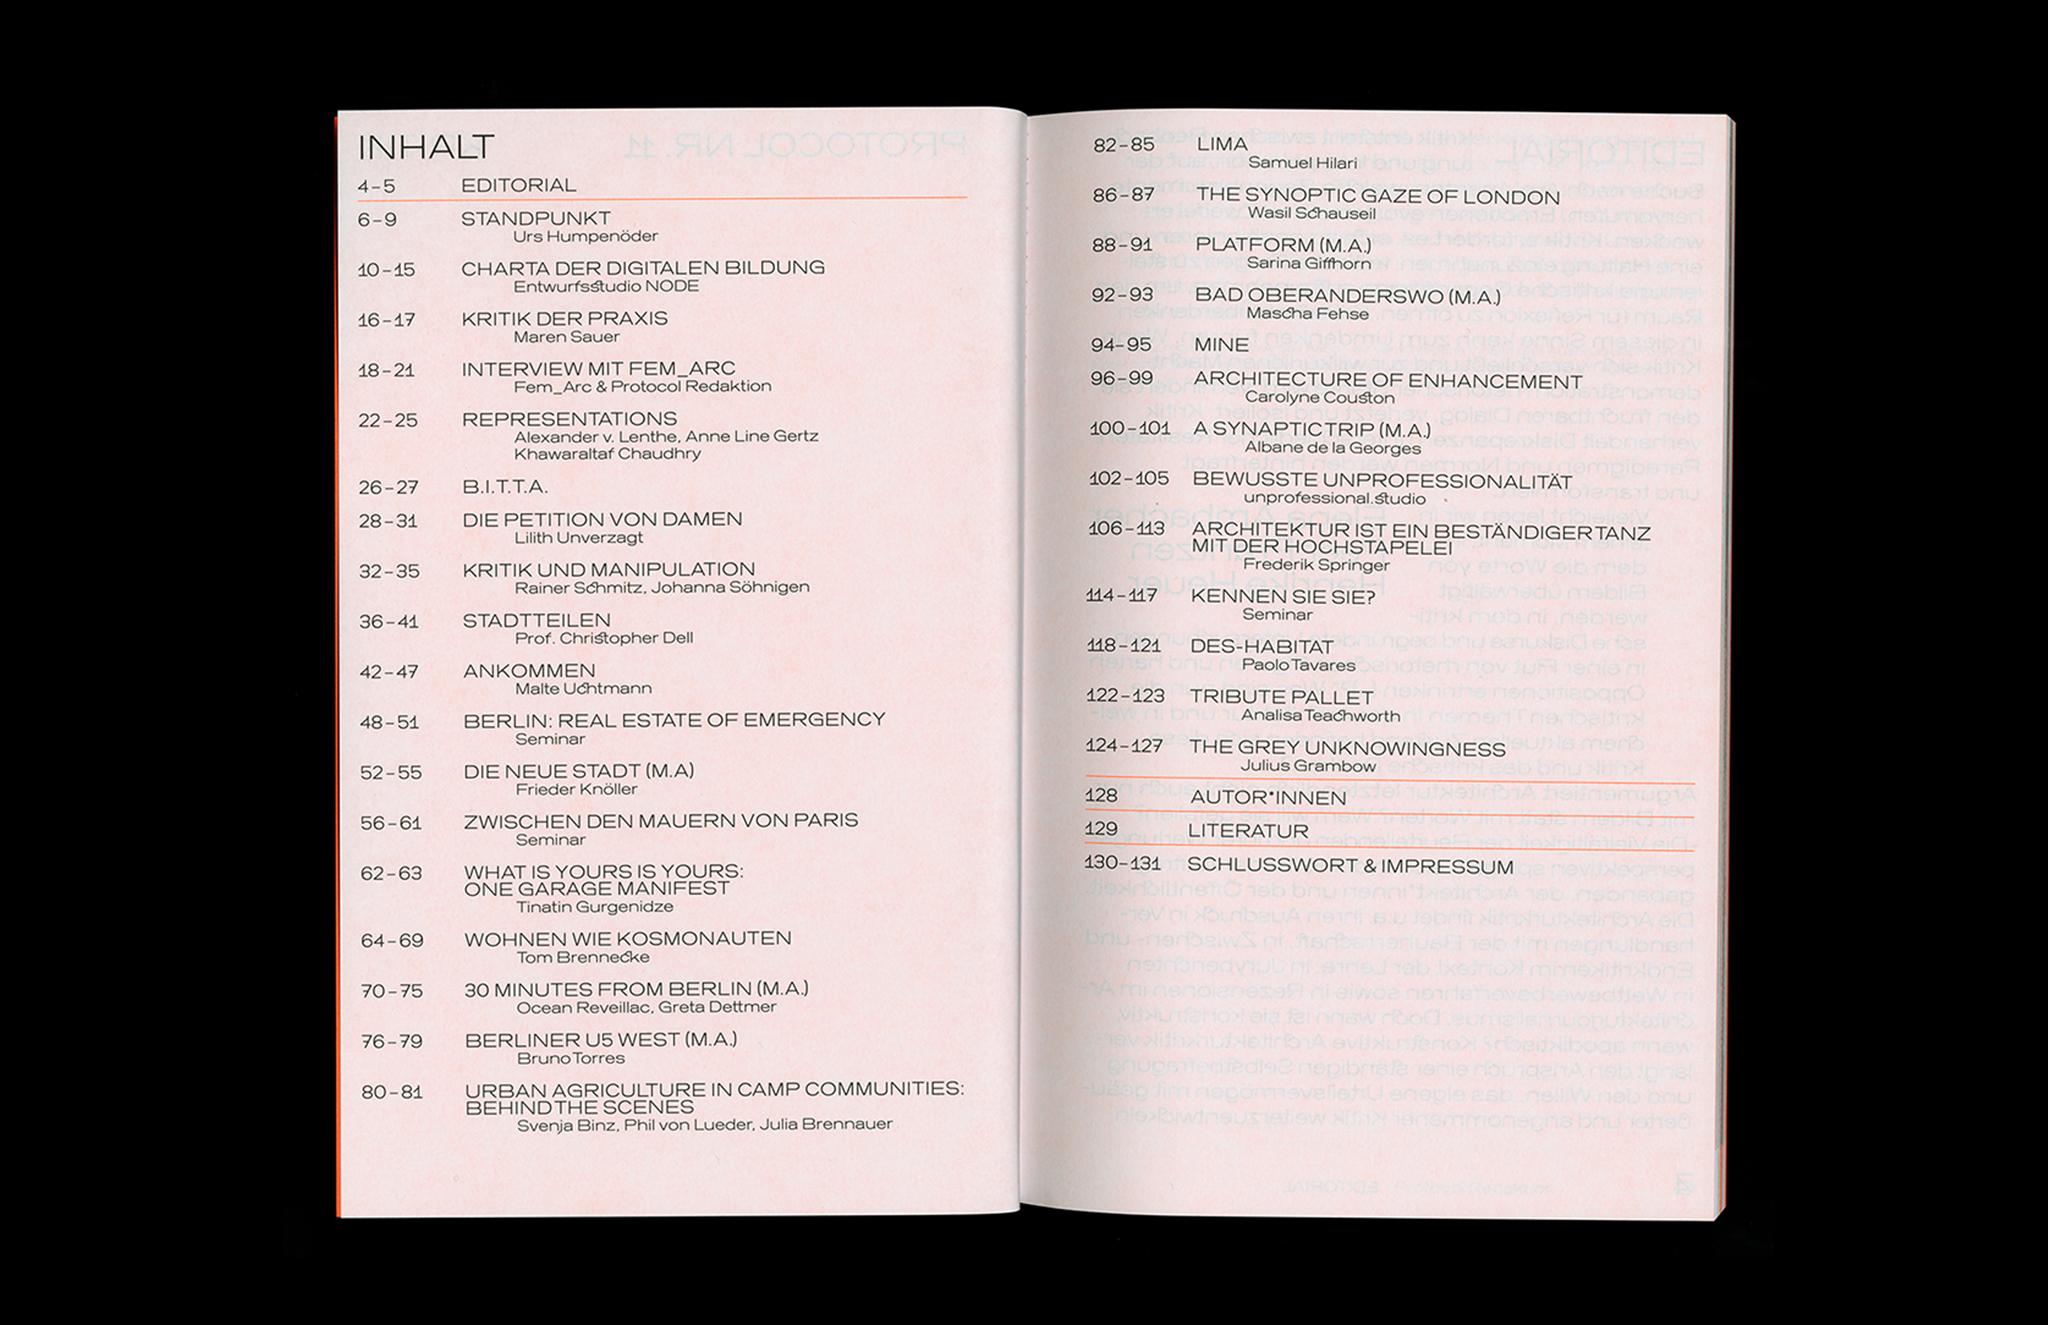 Protocol Nr.11 – Magazin für Architektur im Kontext Table of Contents